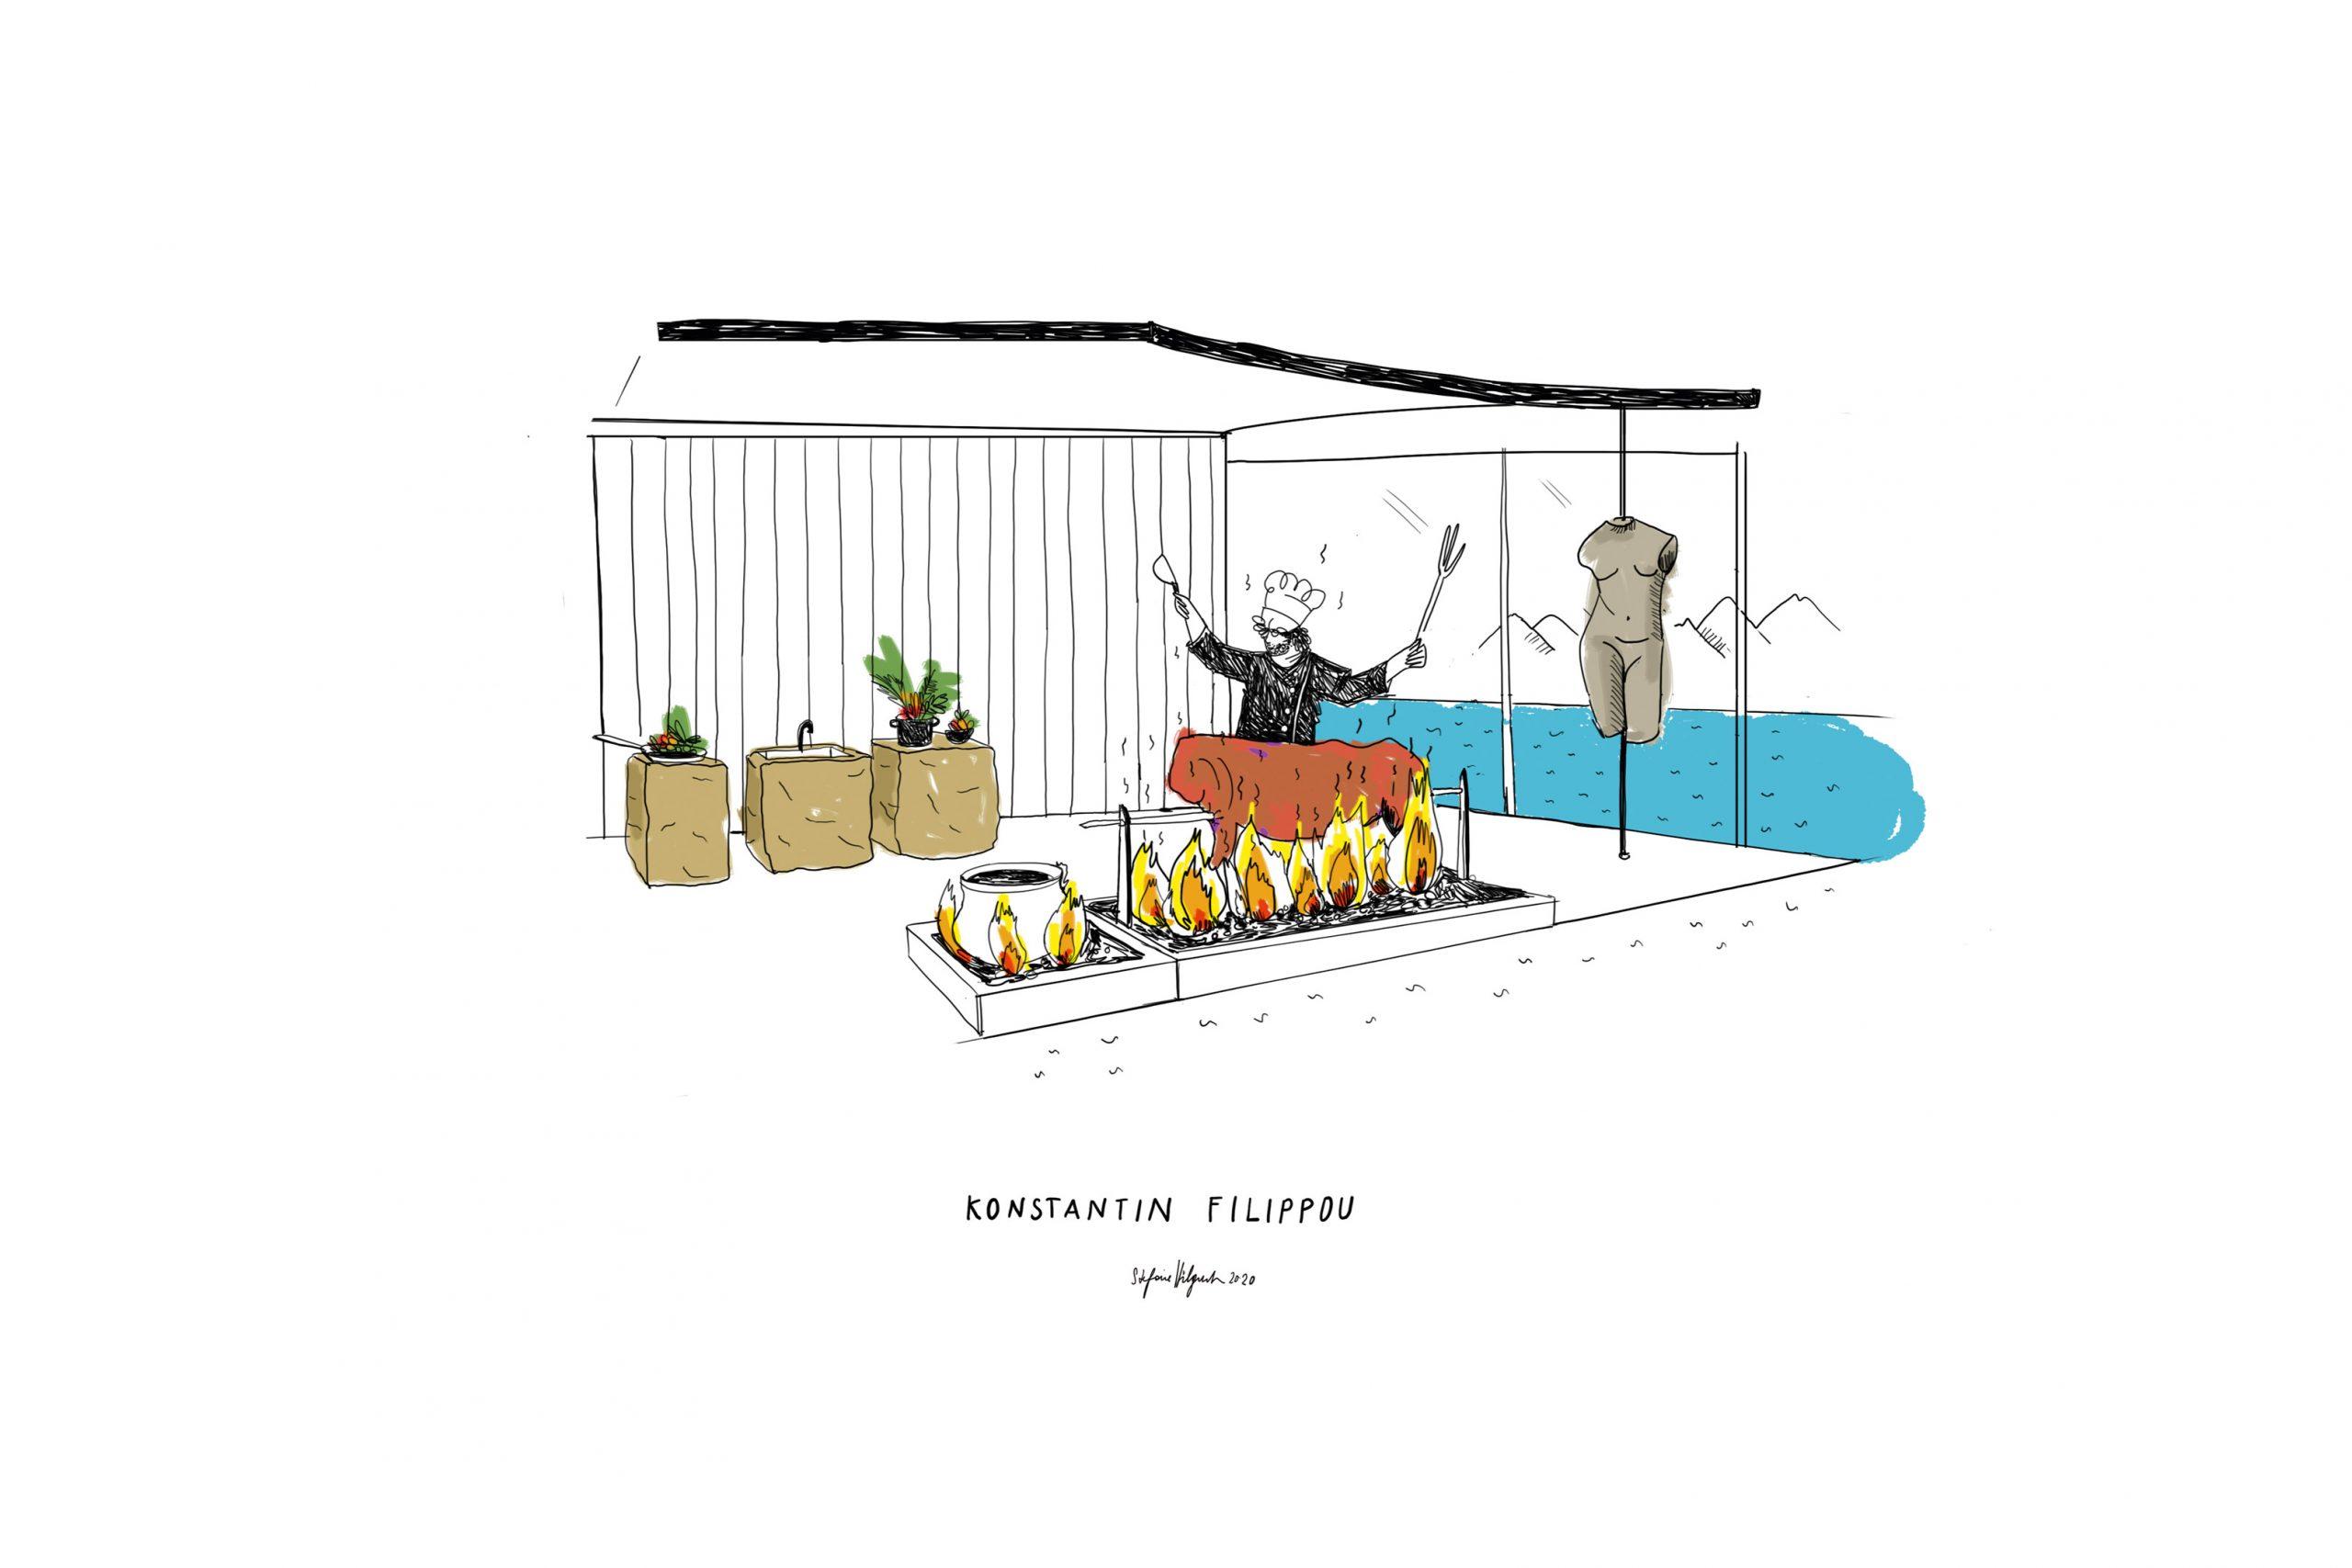 04_Wunschhaus_SMC_Konstantin_Filippou_web_4zu3_Illustration-scaled